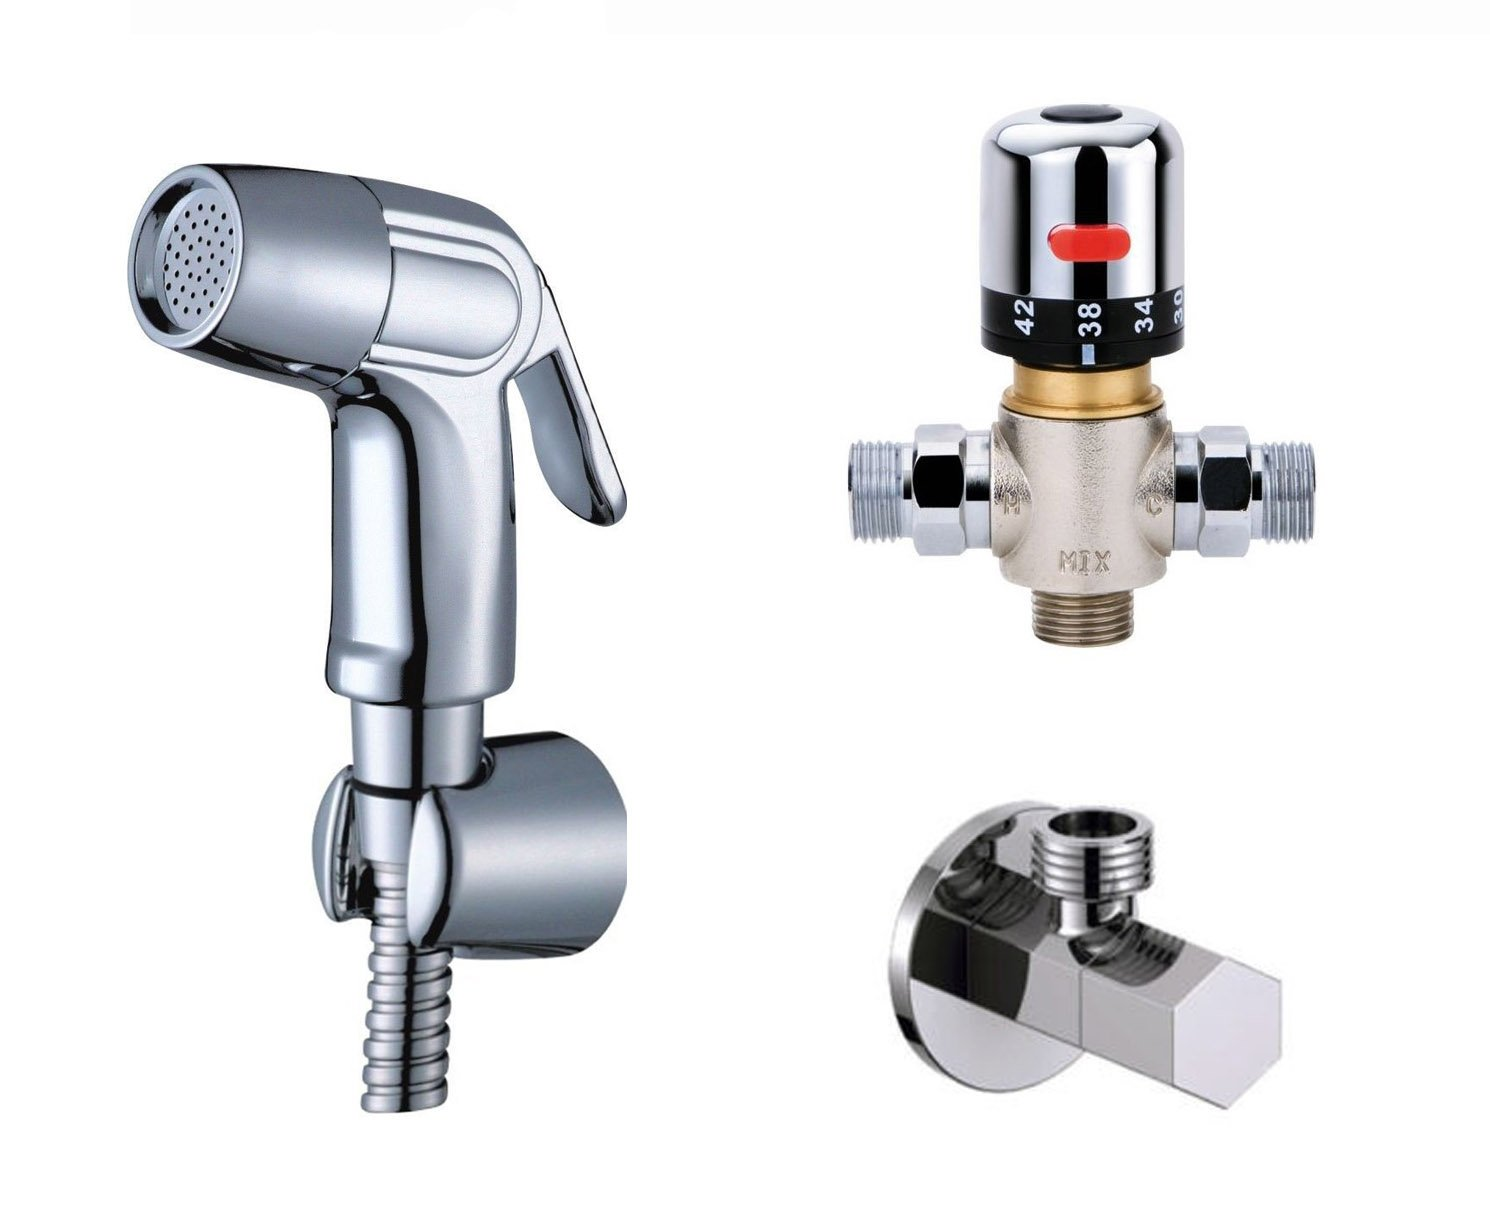 Ownace Bath Toilet Wall Mounted Thermostatic Mixer Valve Handheld Bidet Sprayer Shower Head Douche kit Set by Ownace